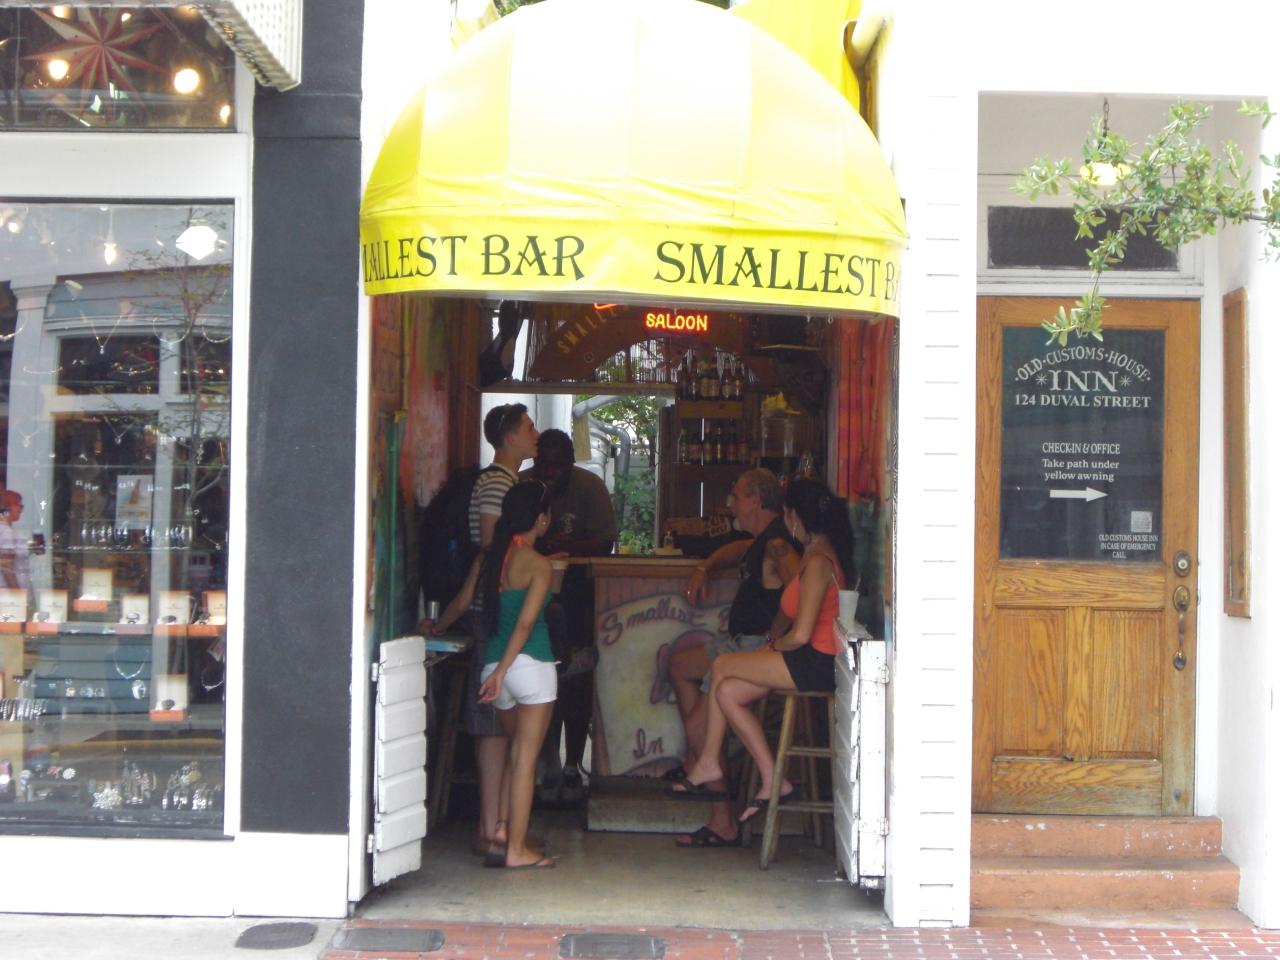 Smallest Bar